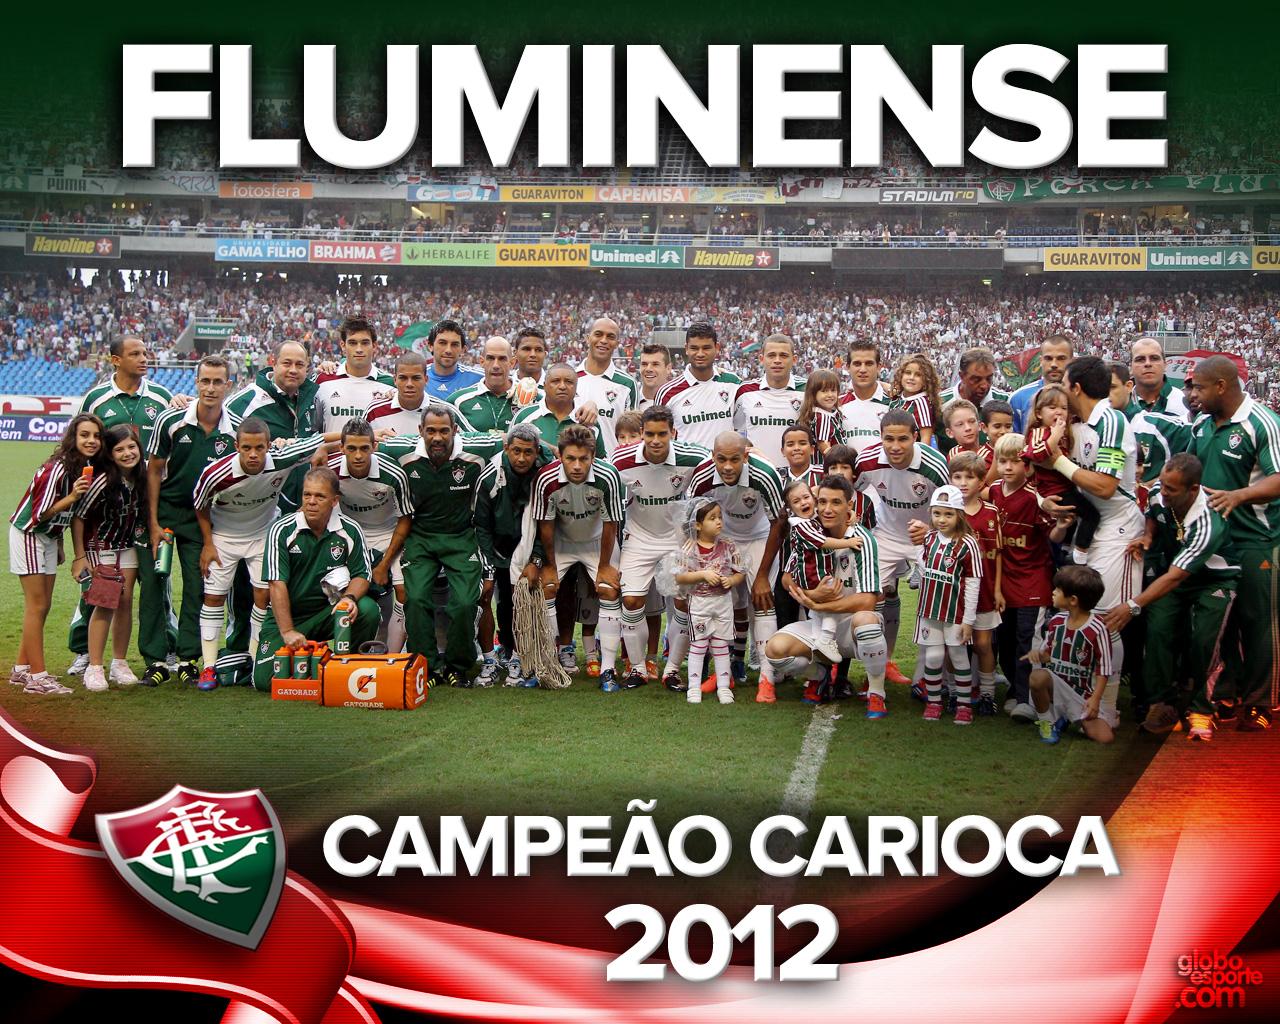 http://1.bp.blogspot.com/-kJXxX3Br4w0/T7v4_AWROvI/AAAAAAAABOA/HrKoQq7xo5I/s1600/Wallpaper_Fluminense.jpg